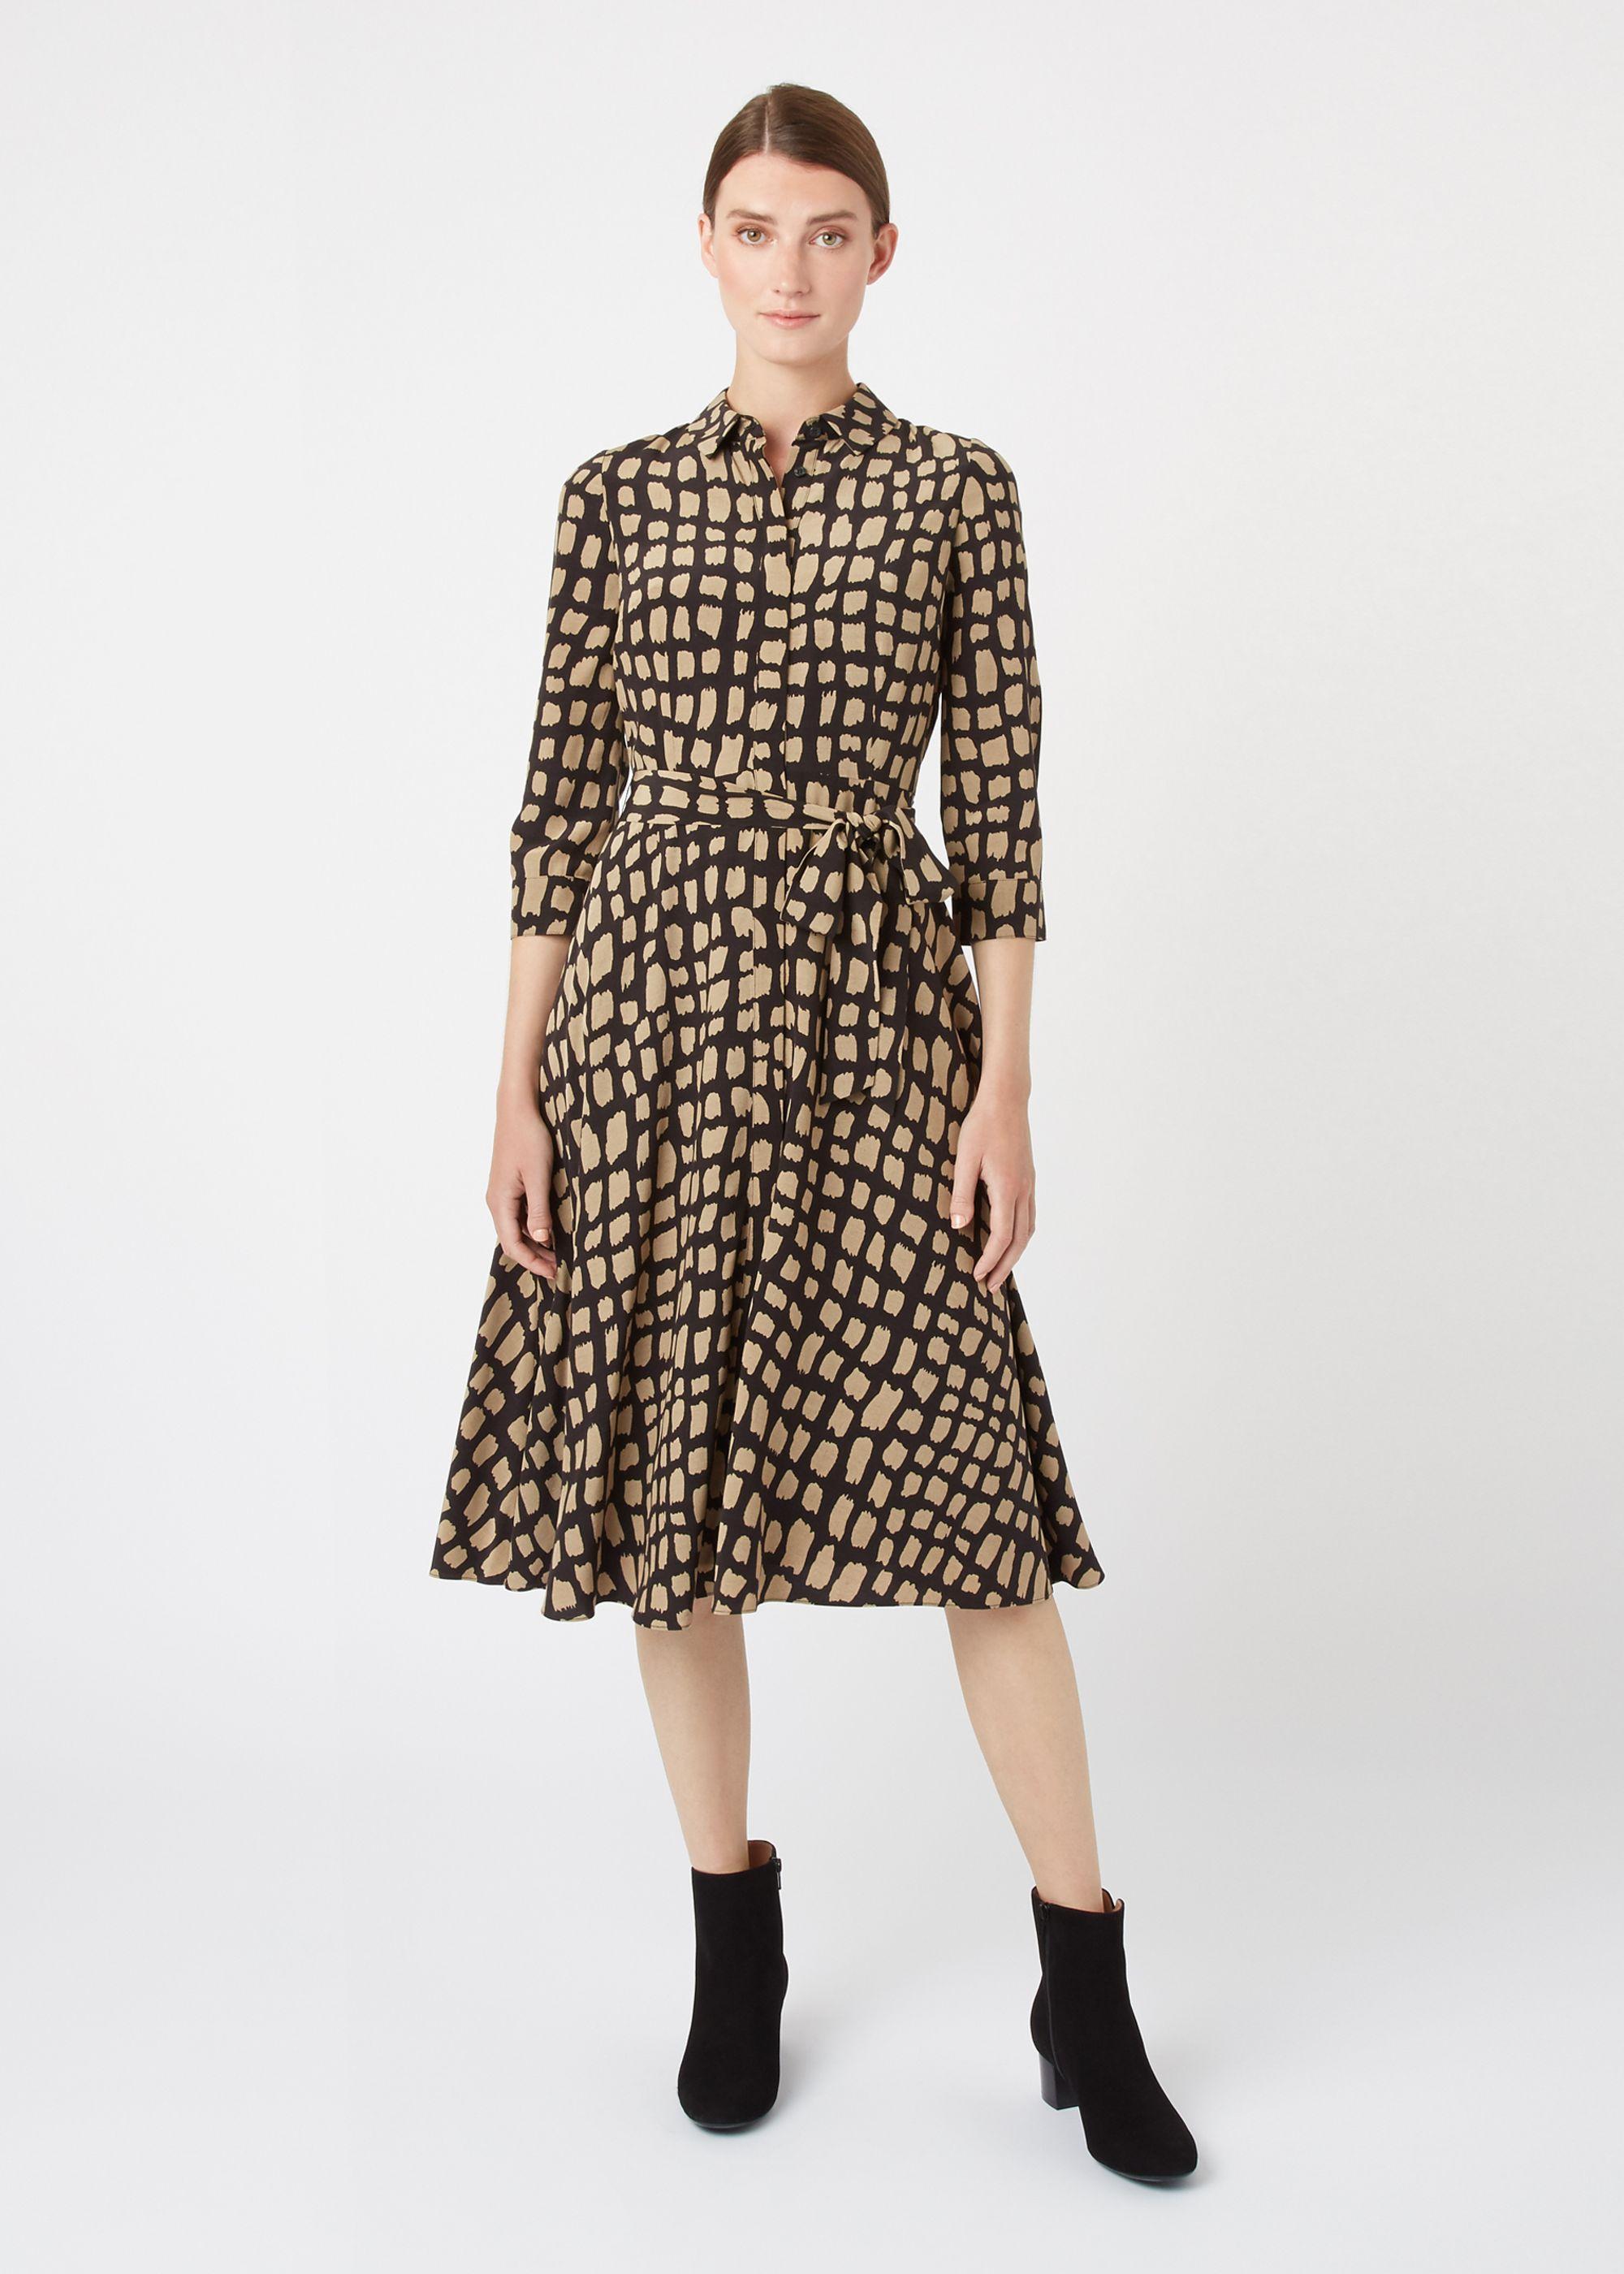 Hobbs Women Petite Lainey Dress